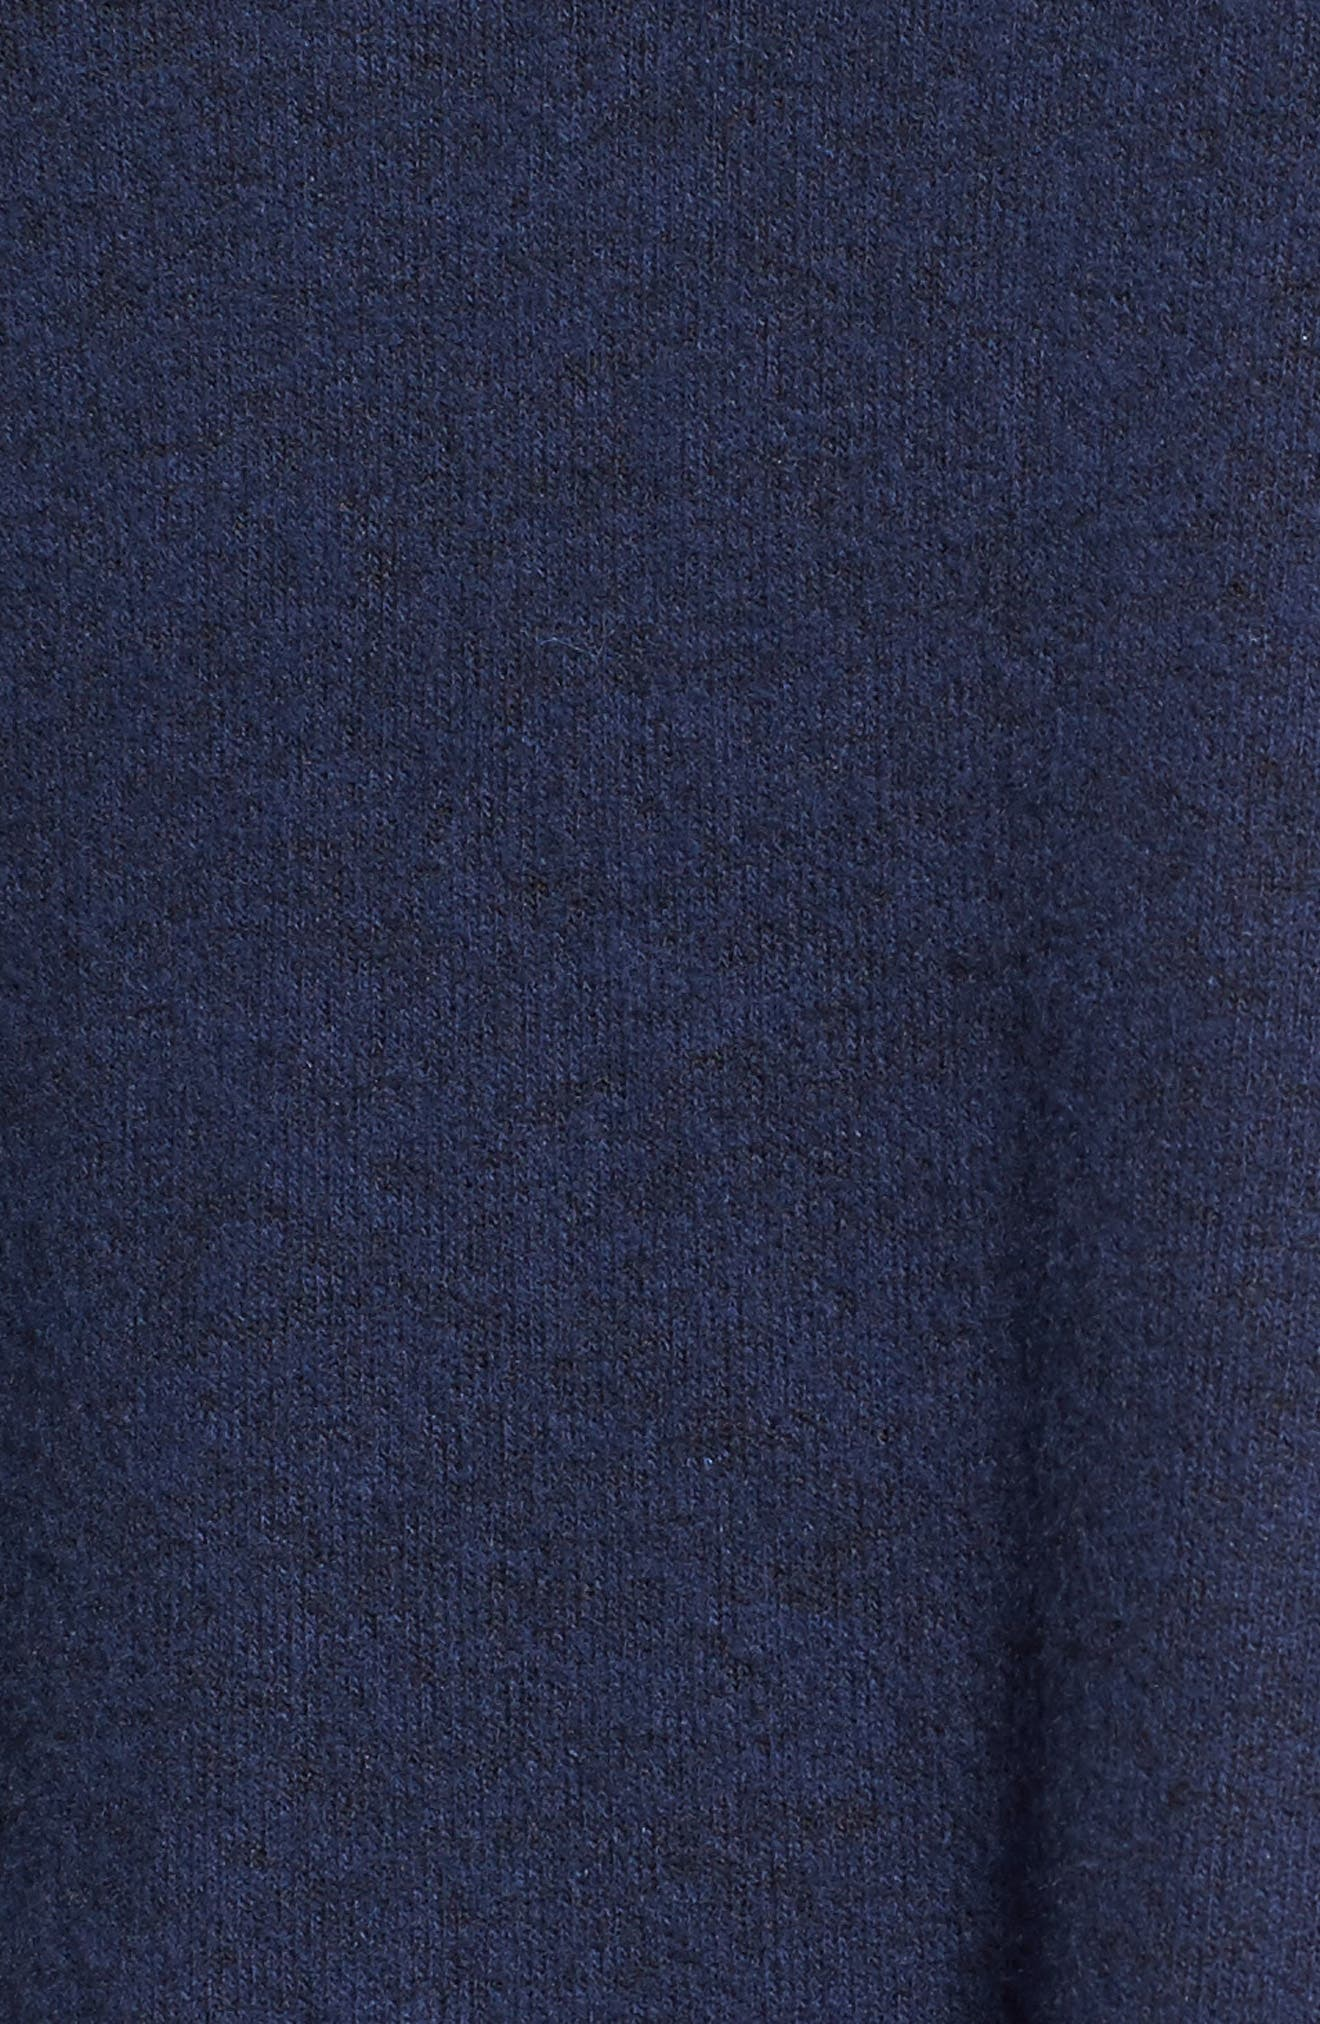 Bell Sleeve Cozy Fleece Pullover,                             Alternate thumbnail 57, color,